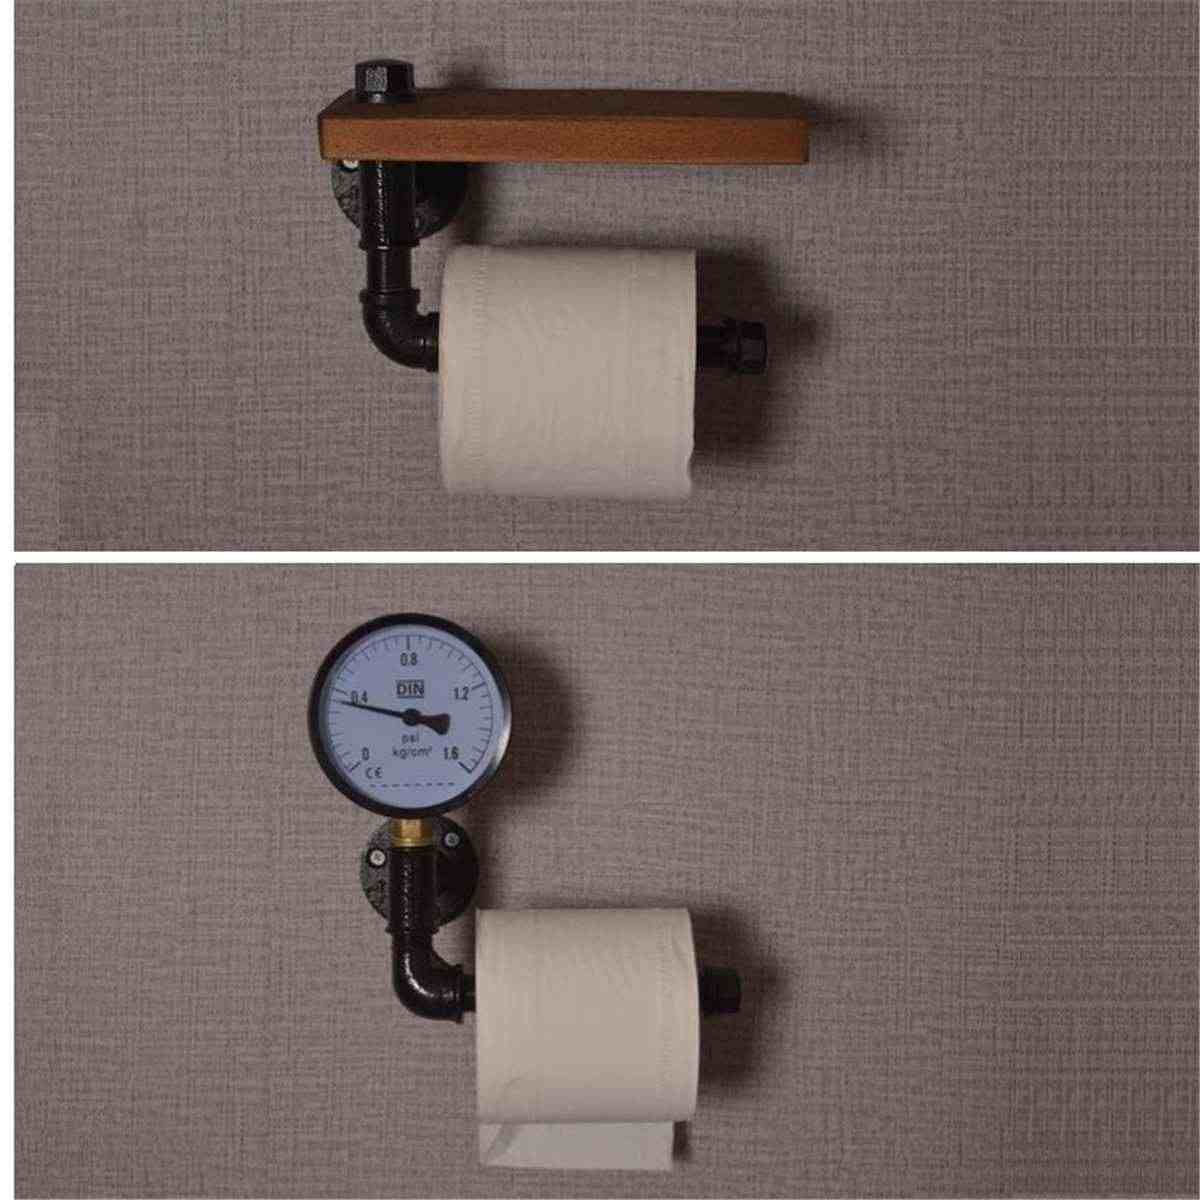 Paper Towel Storage Water Pipe Rack Toilet Paper Roll Holder Pipe Shelf  Rustic Industrial Floating Bathroom Home Roll Paper Box